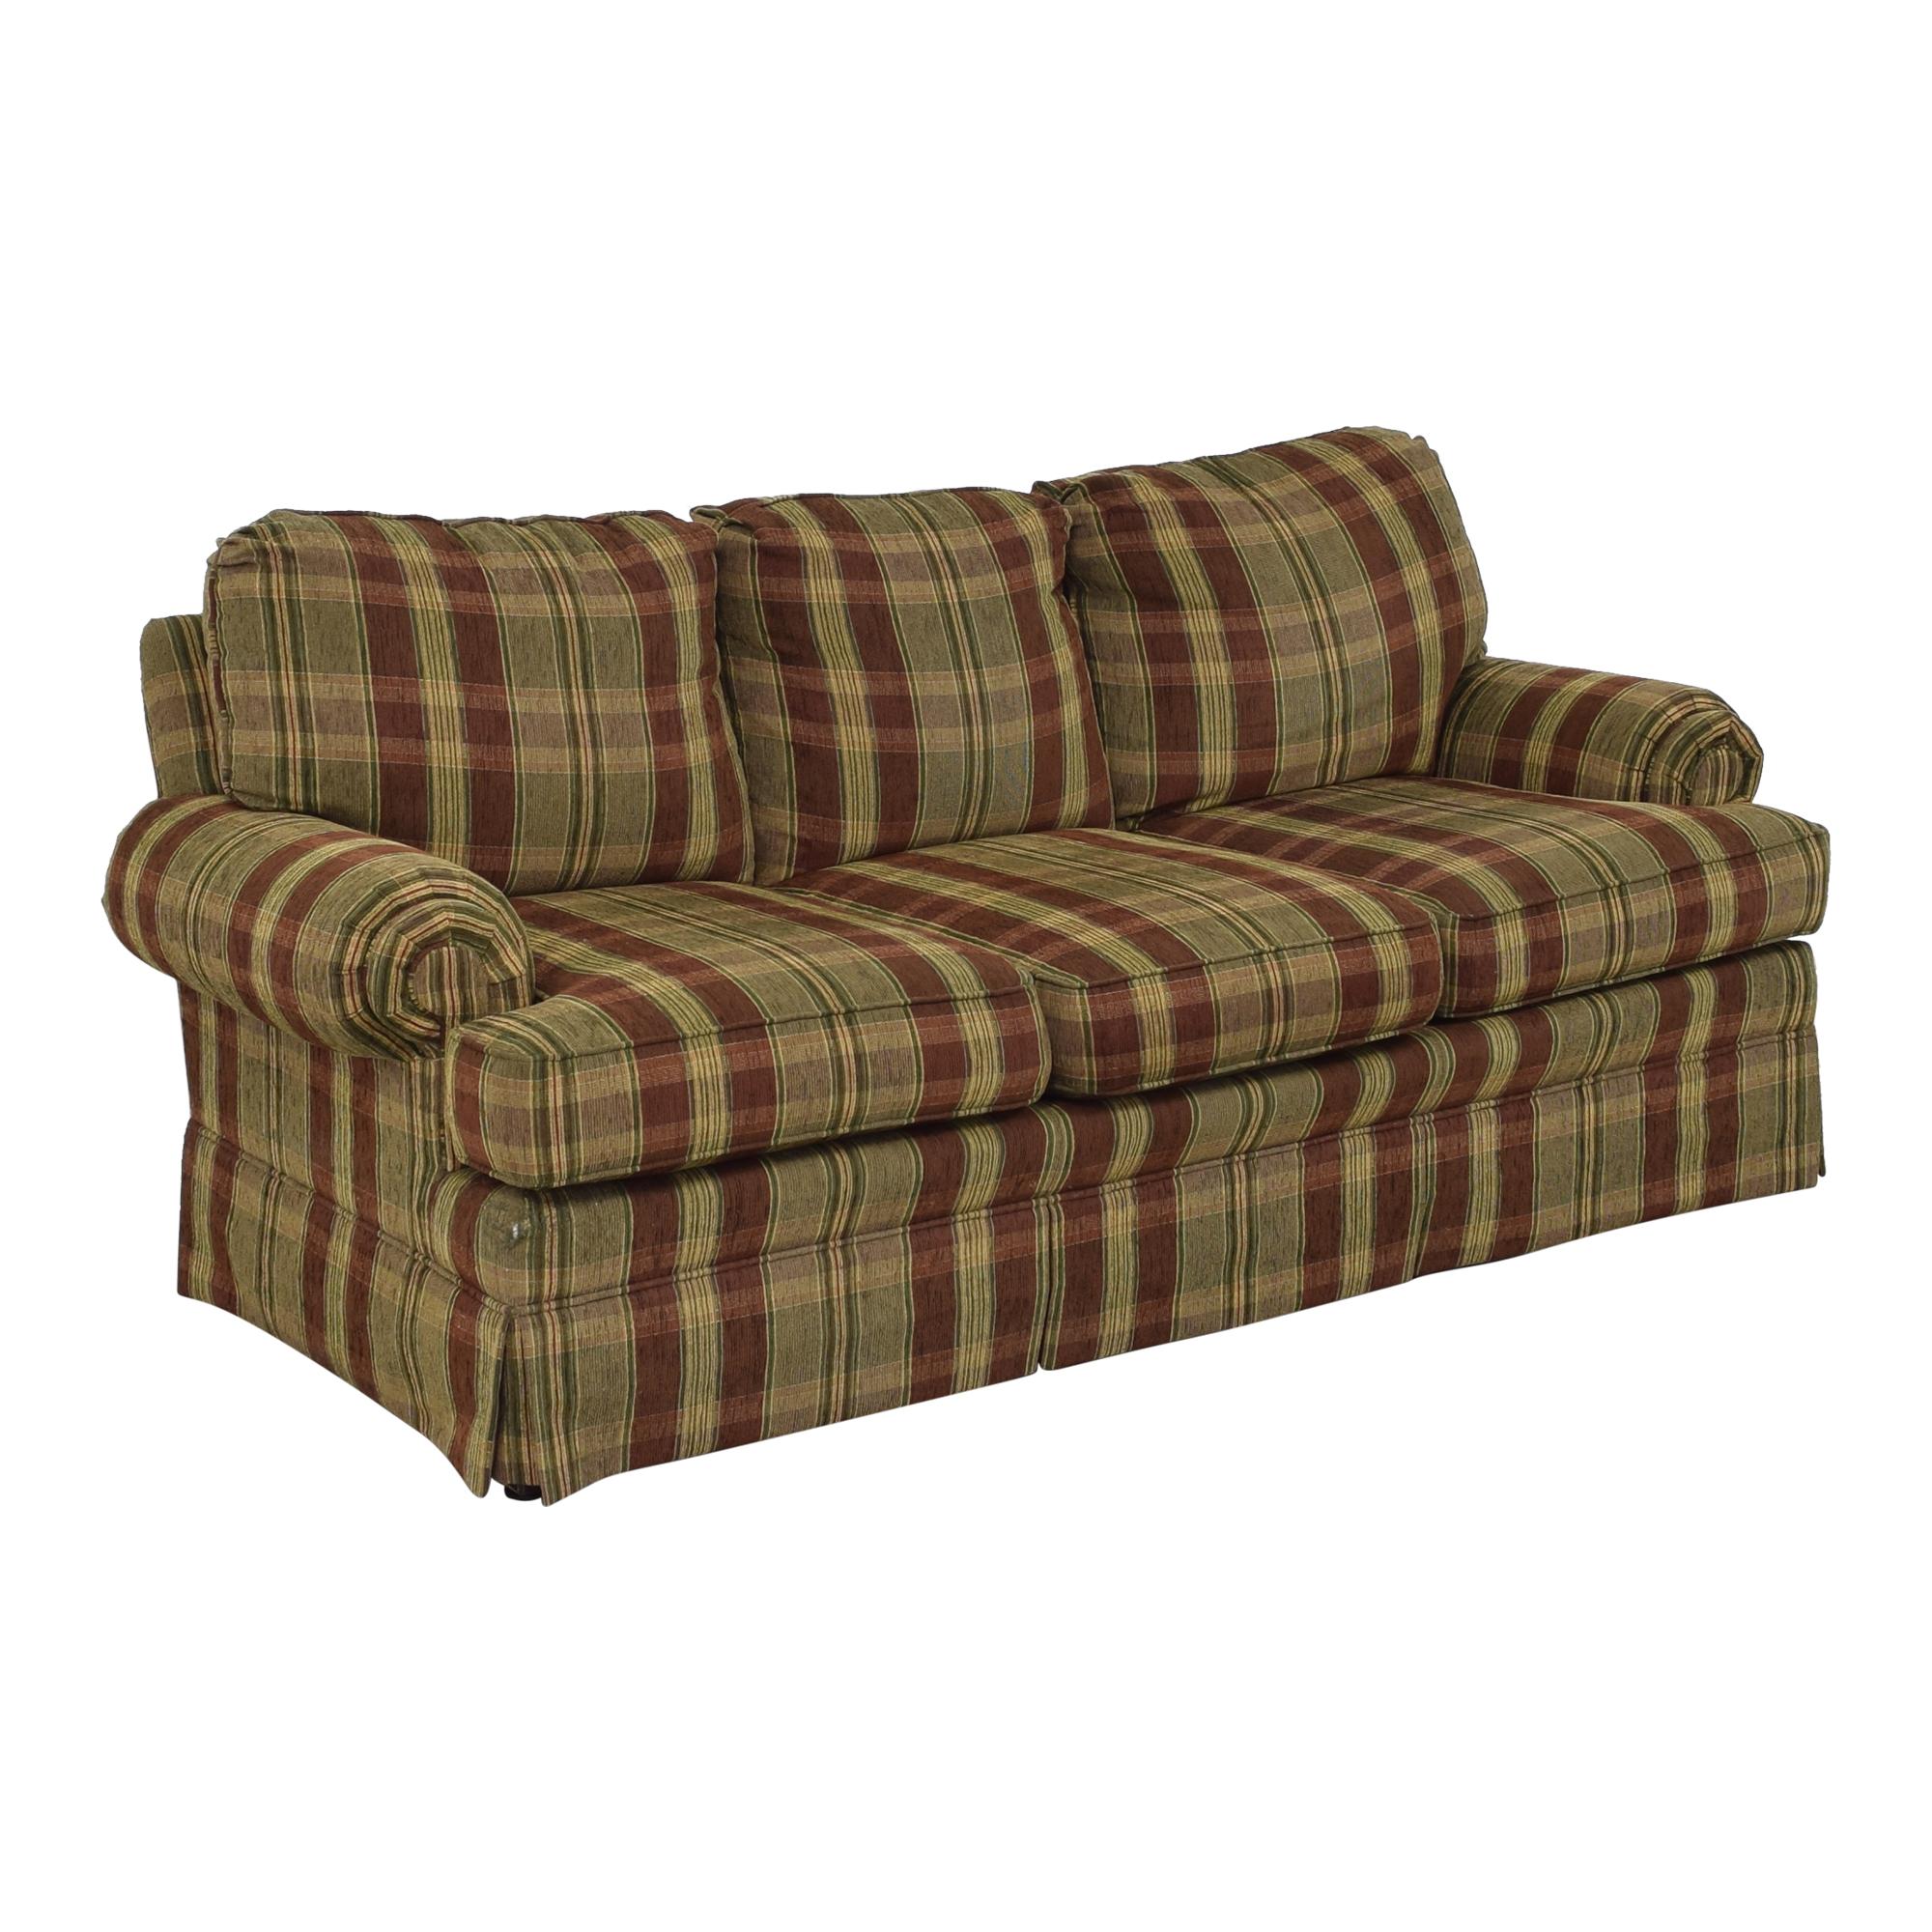 buy Thomasville Thomasville Plaid Skirted Sofa online